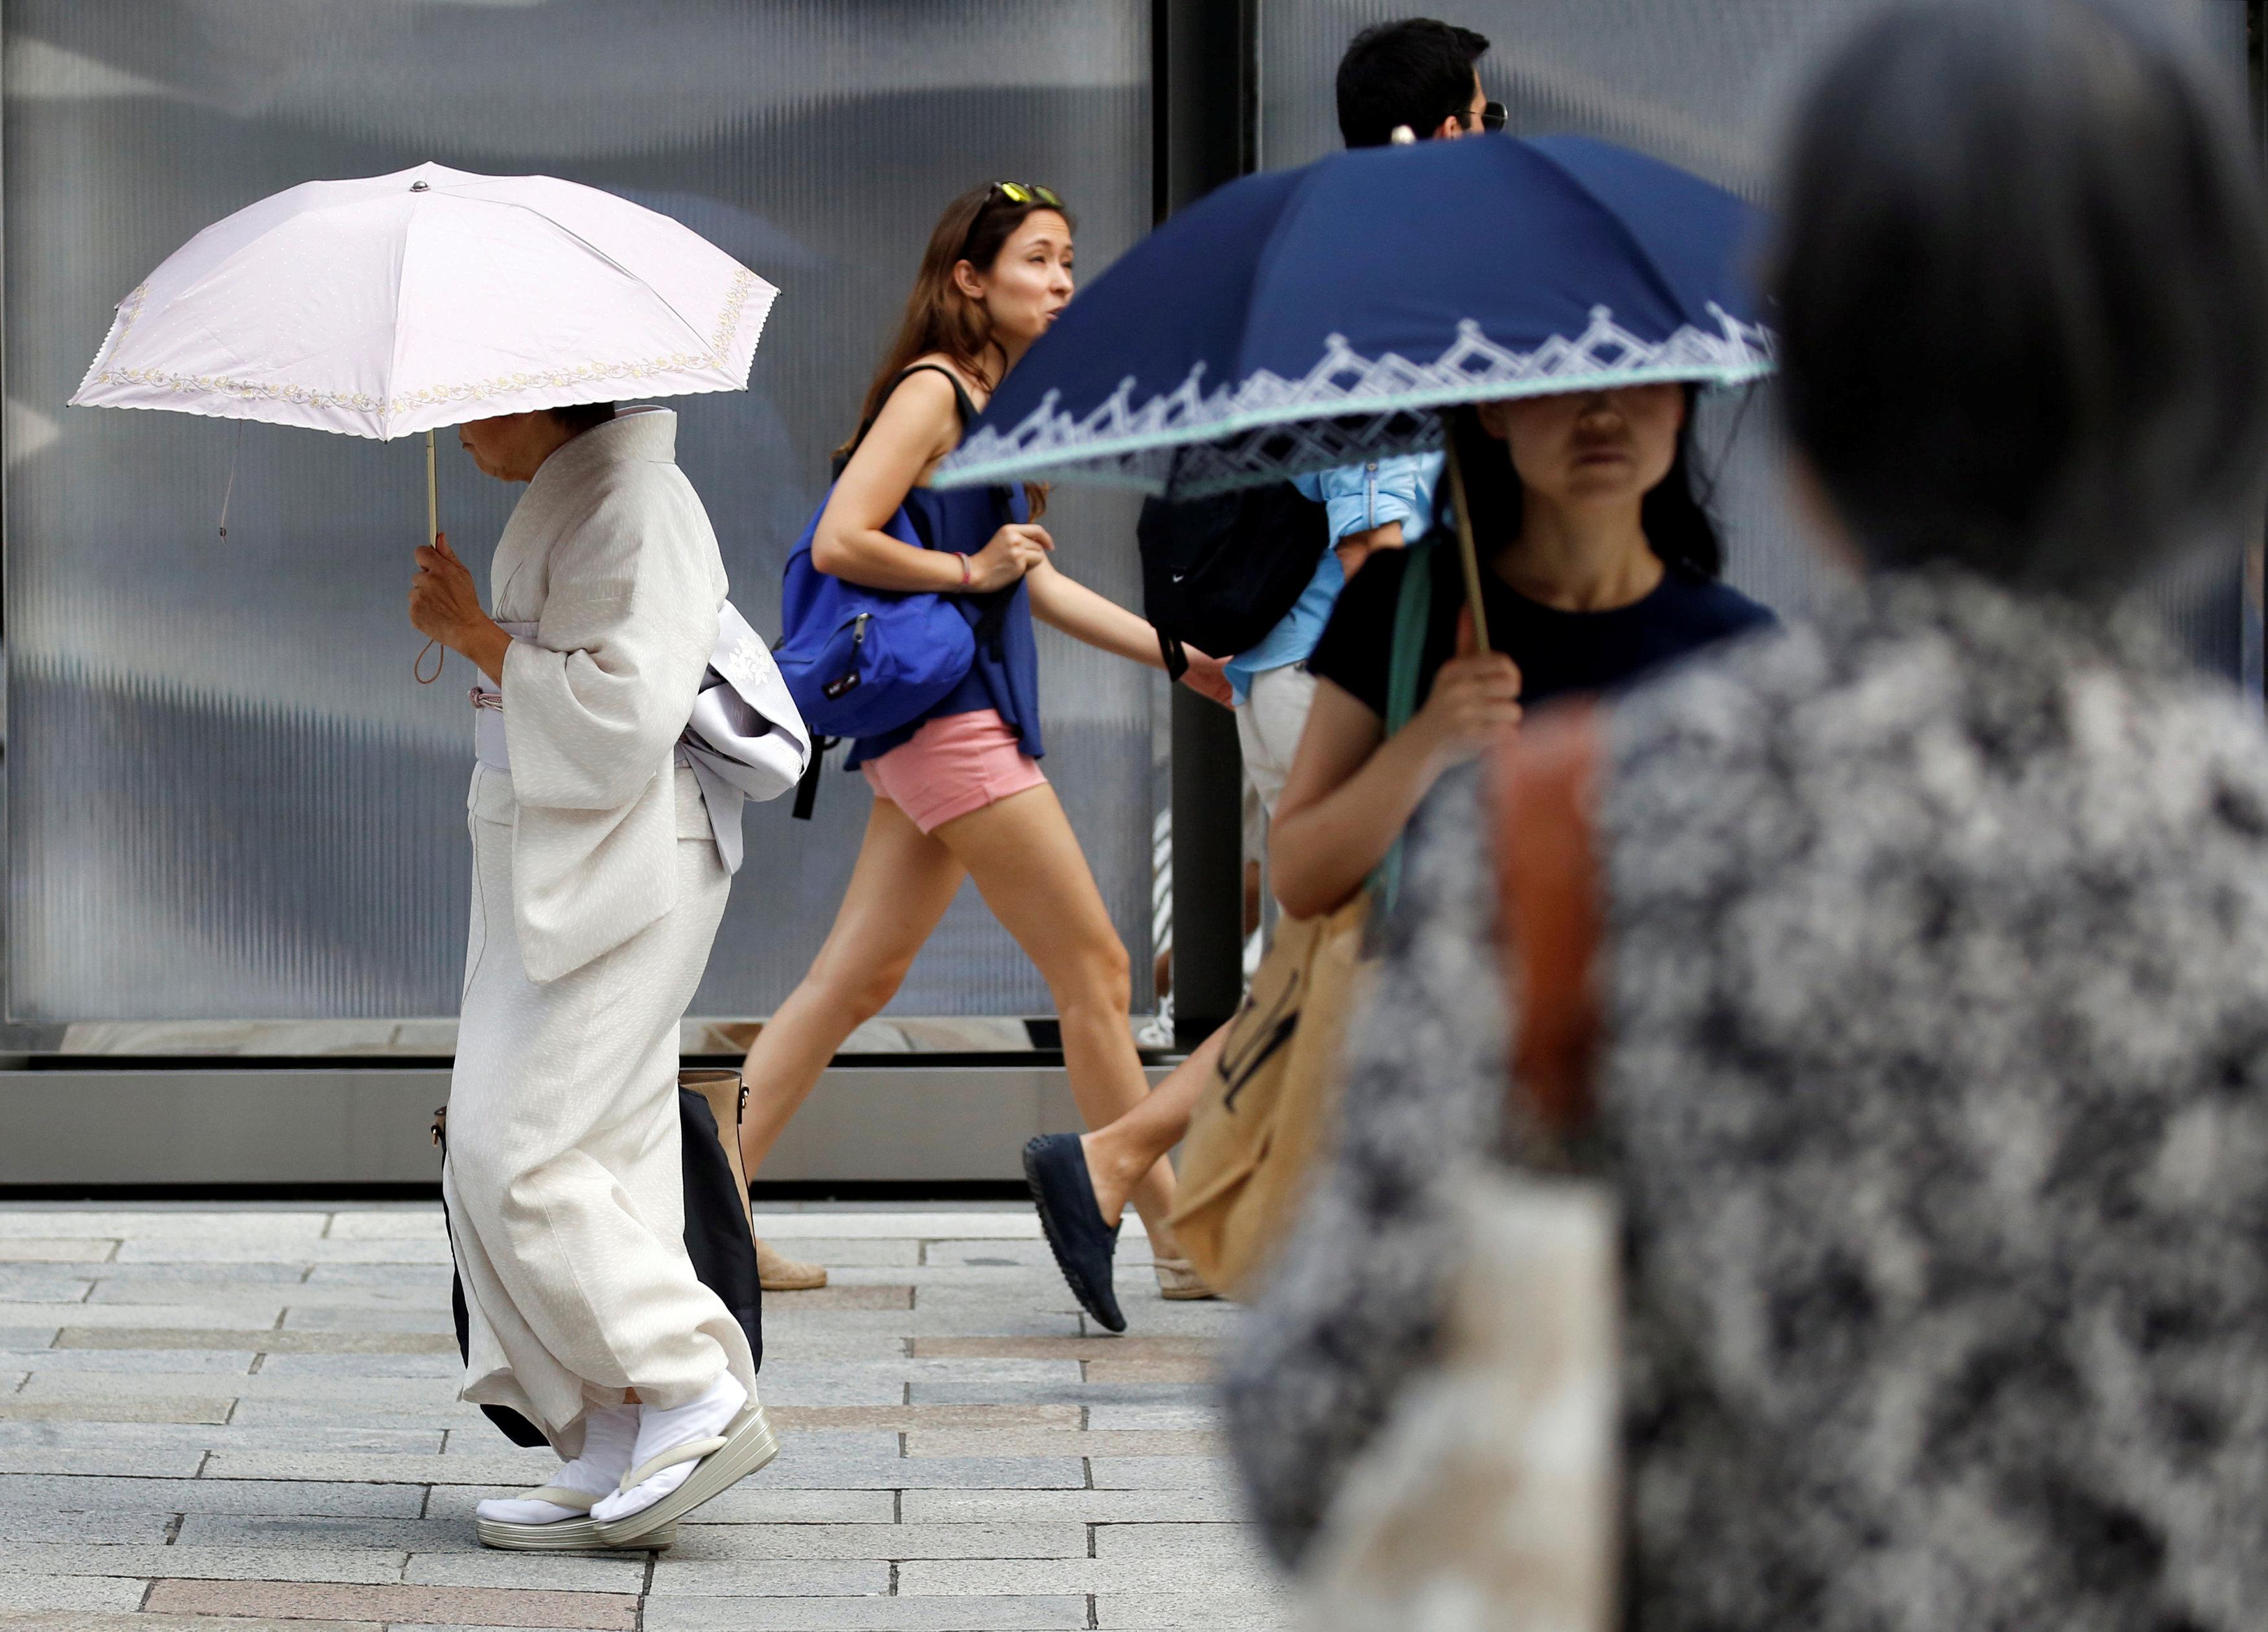 Japan heatwave - street